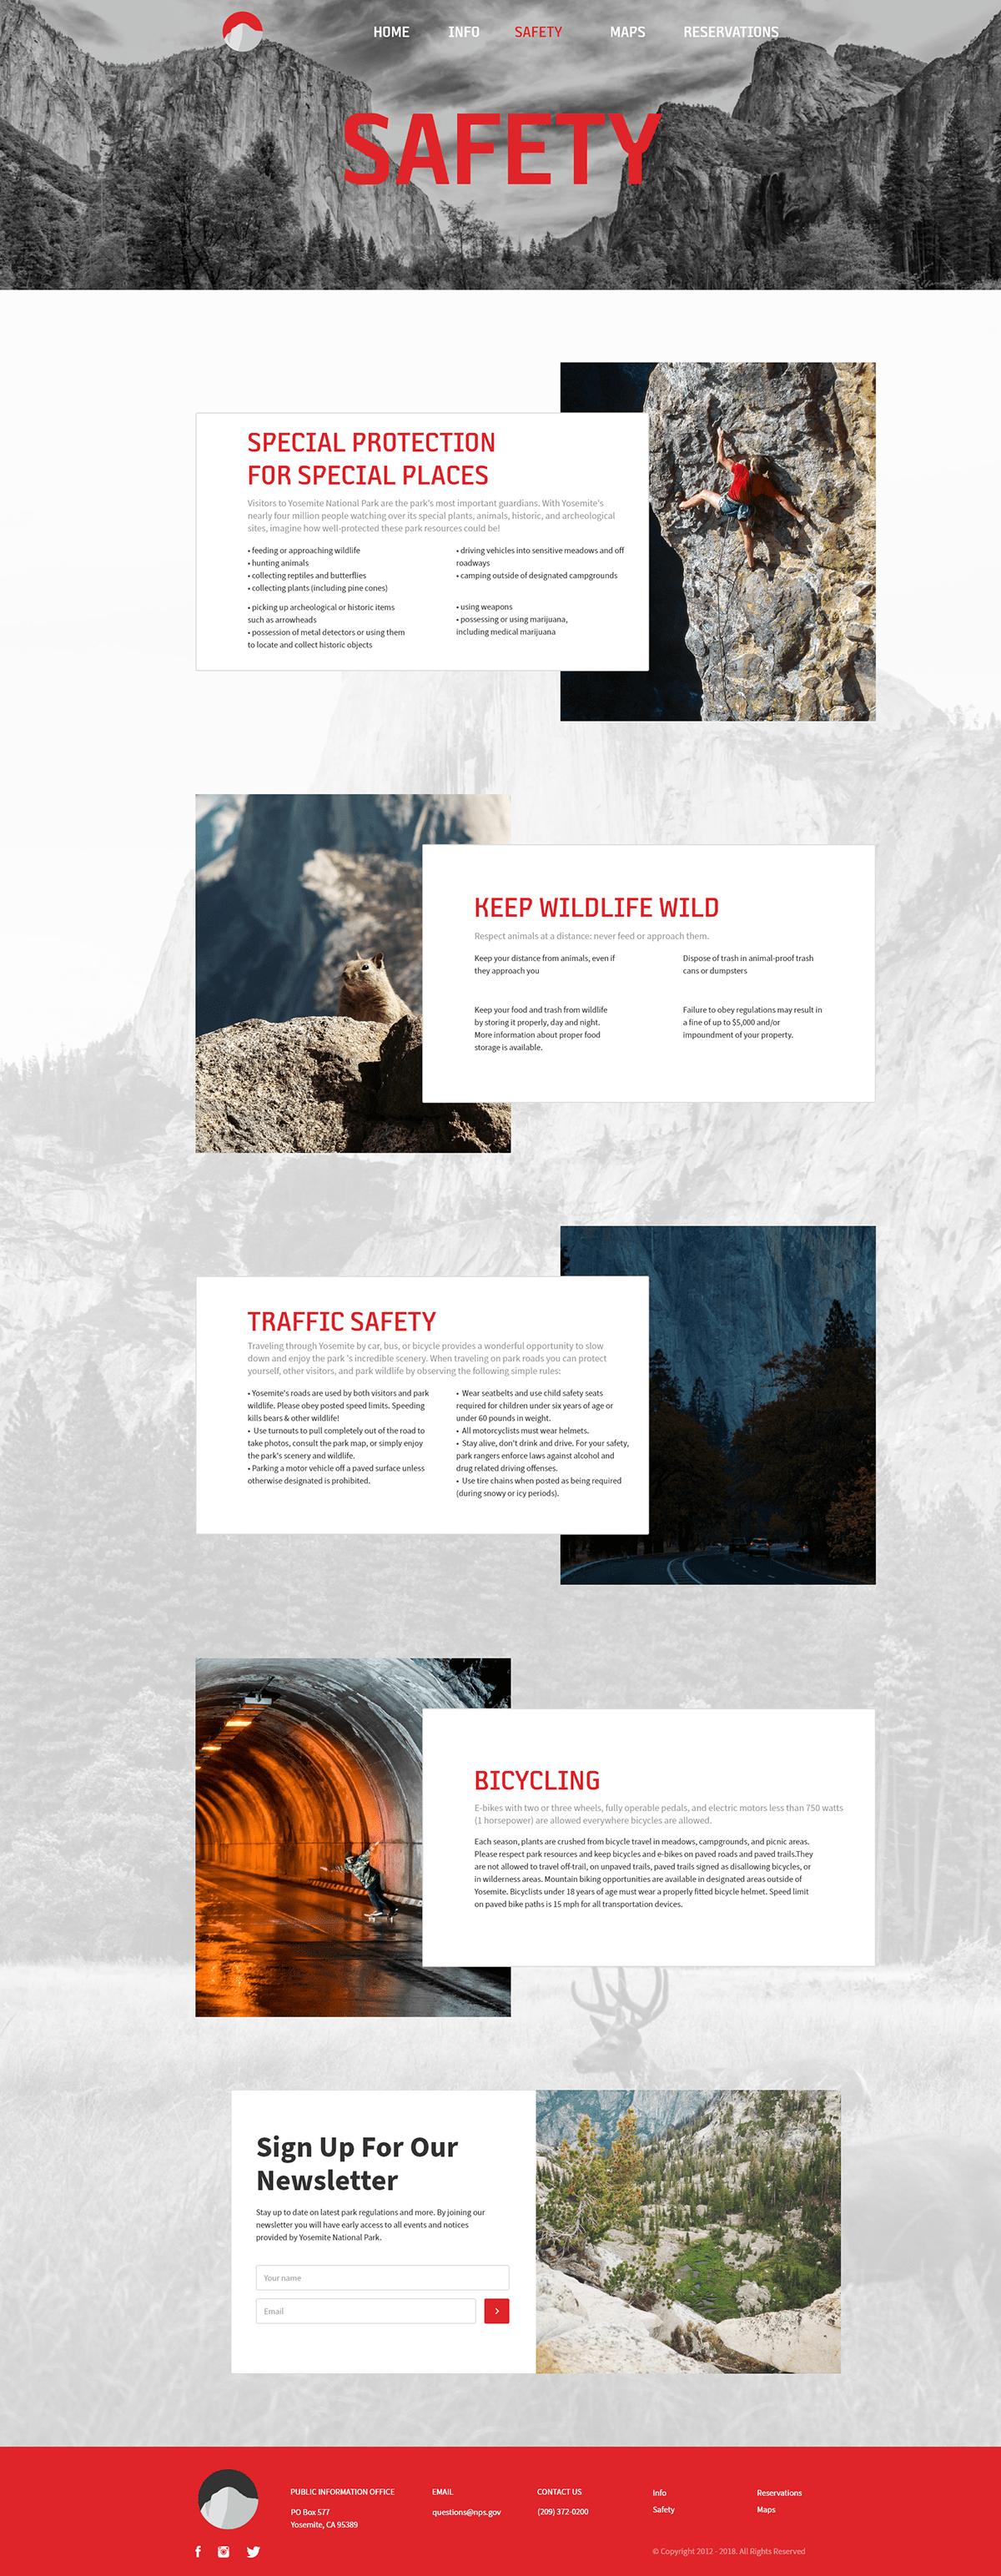 [2020] Advertising  Full Sail GRDBS marketing   web-design